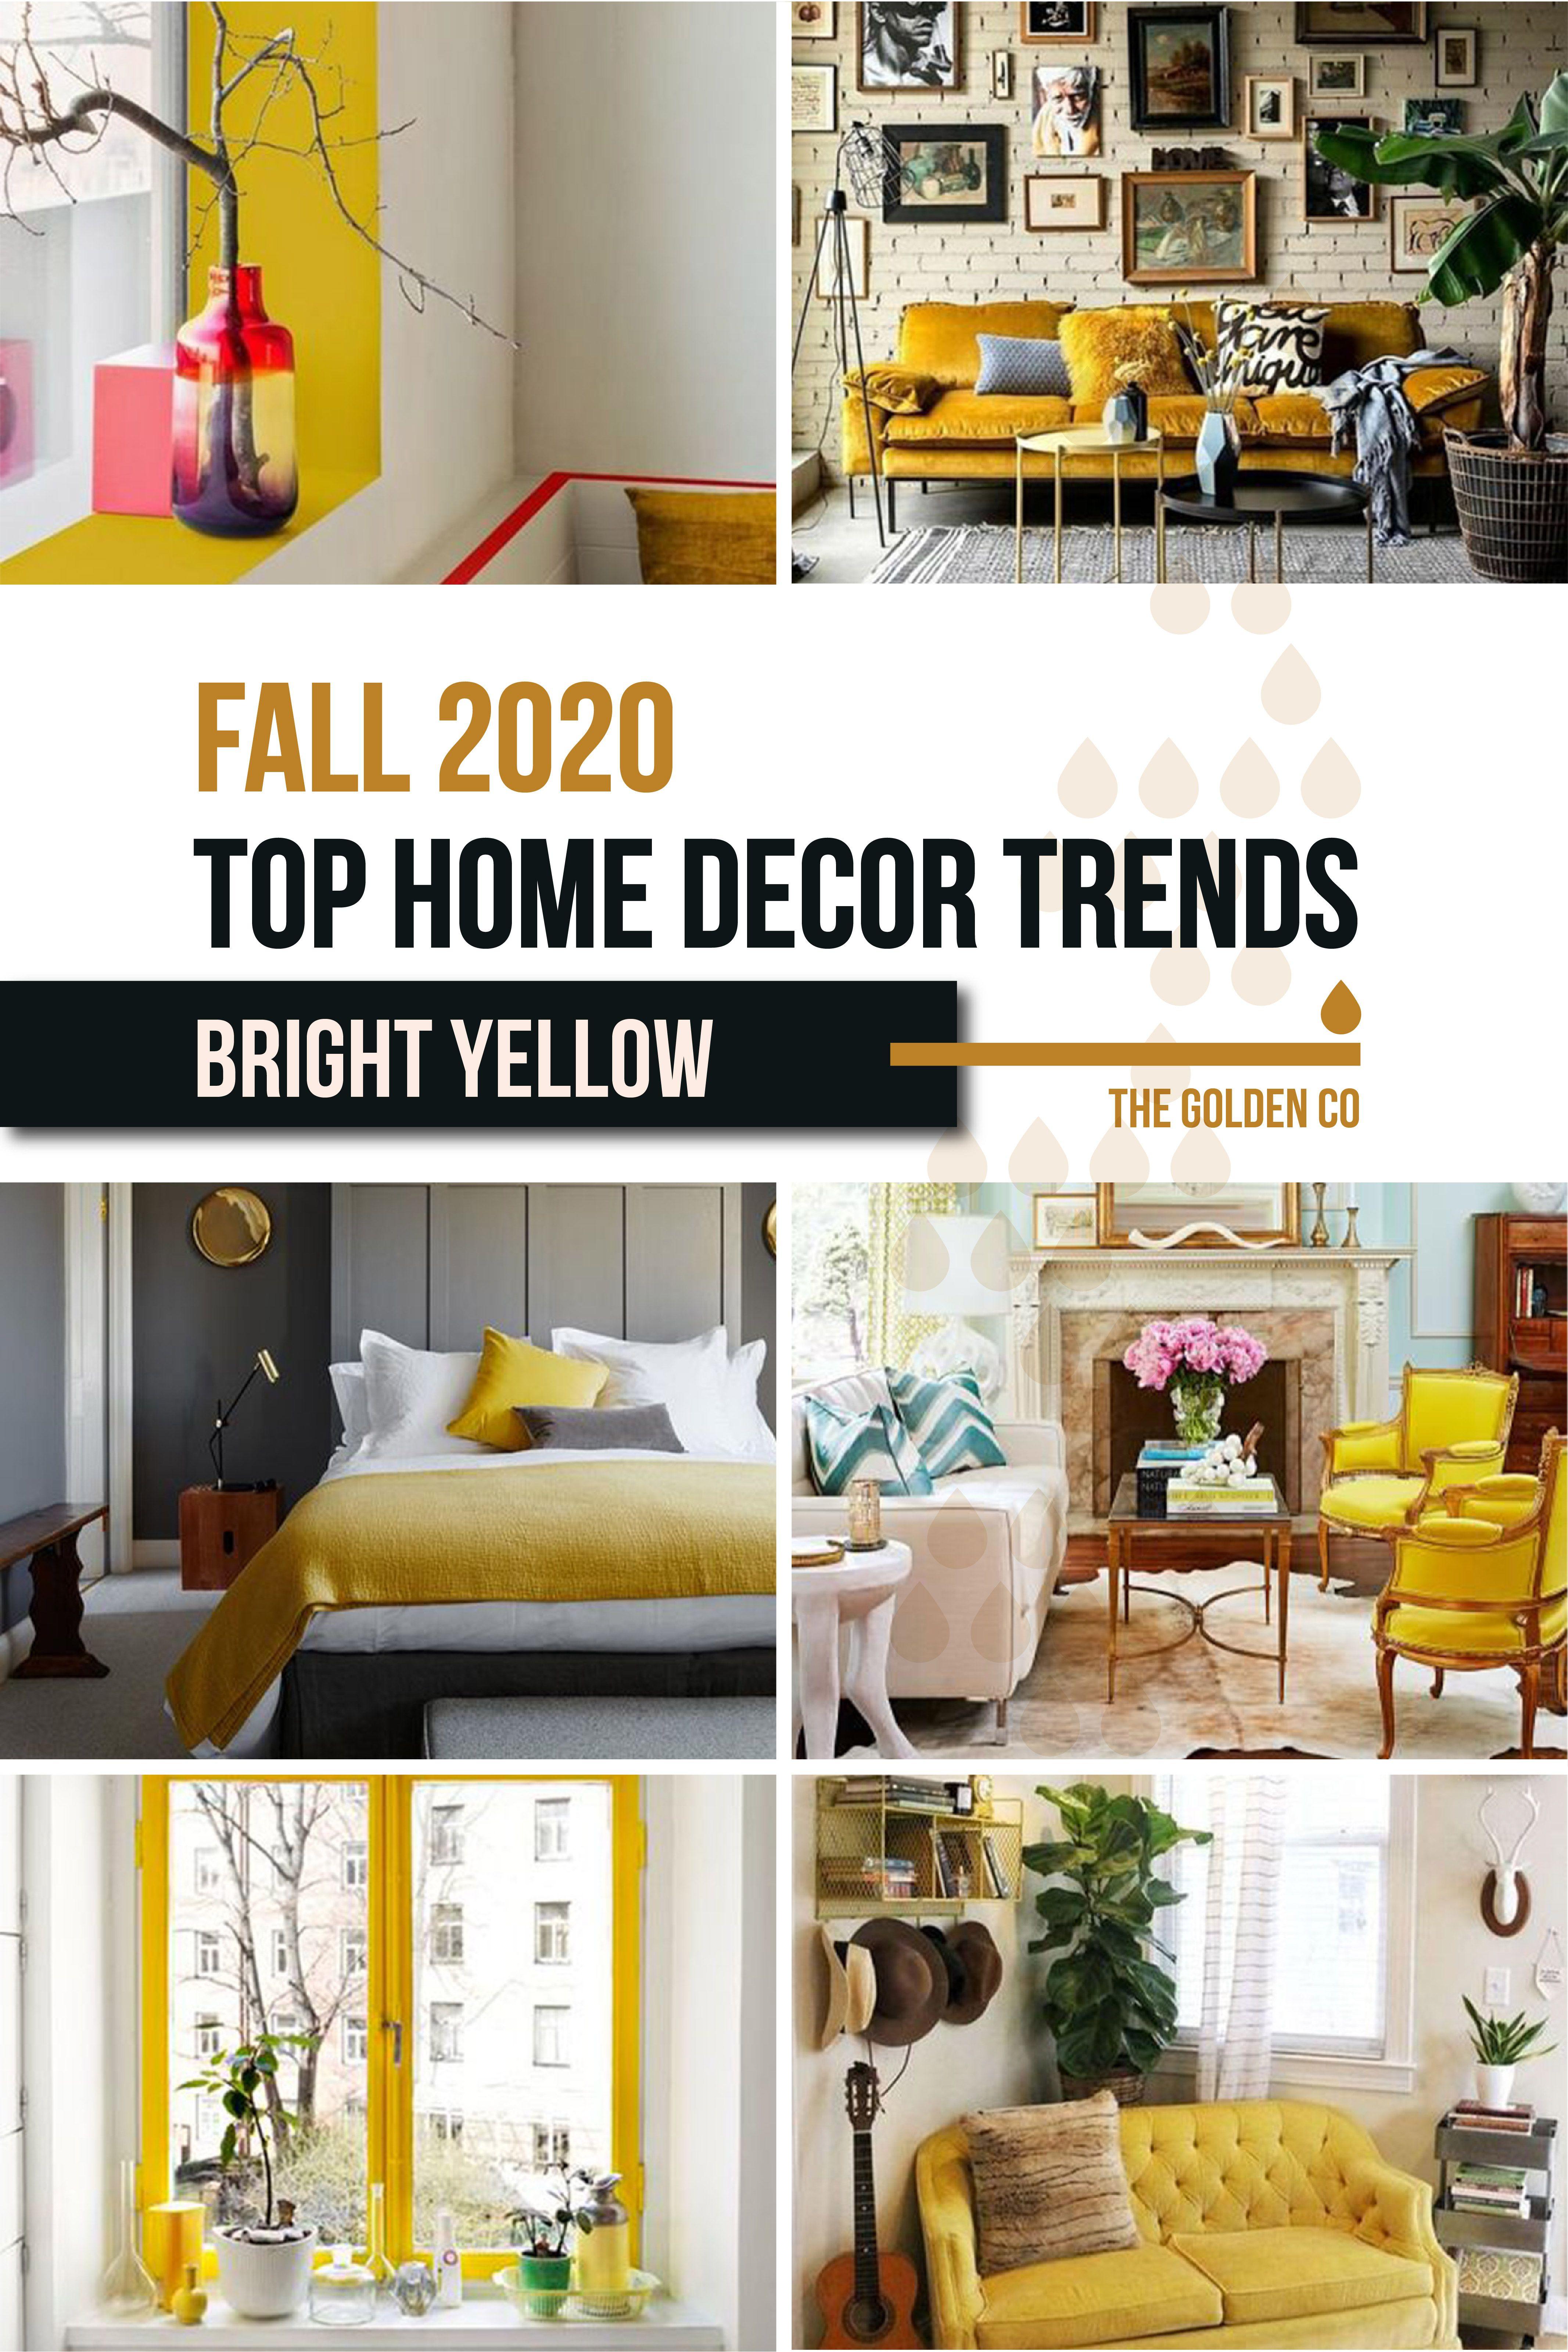 Home Decor Inspo for Fall 32 Bright Yellow   Trending decor ...